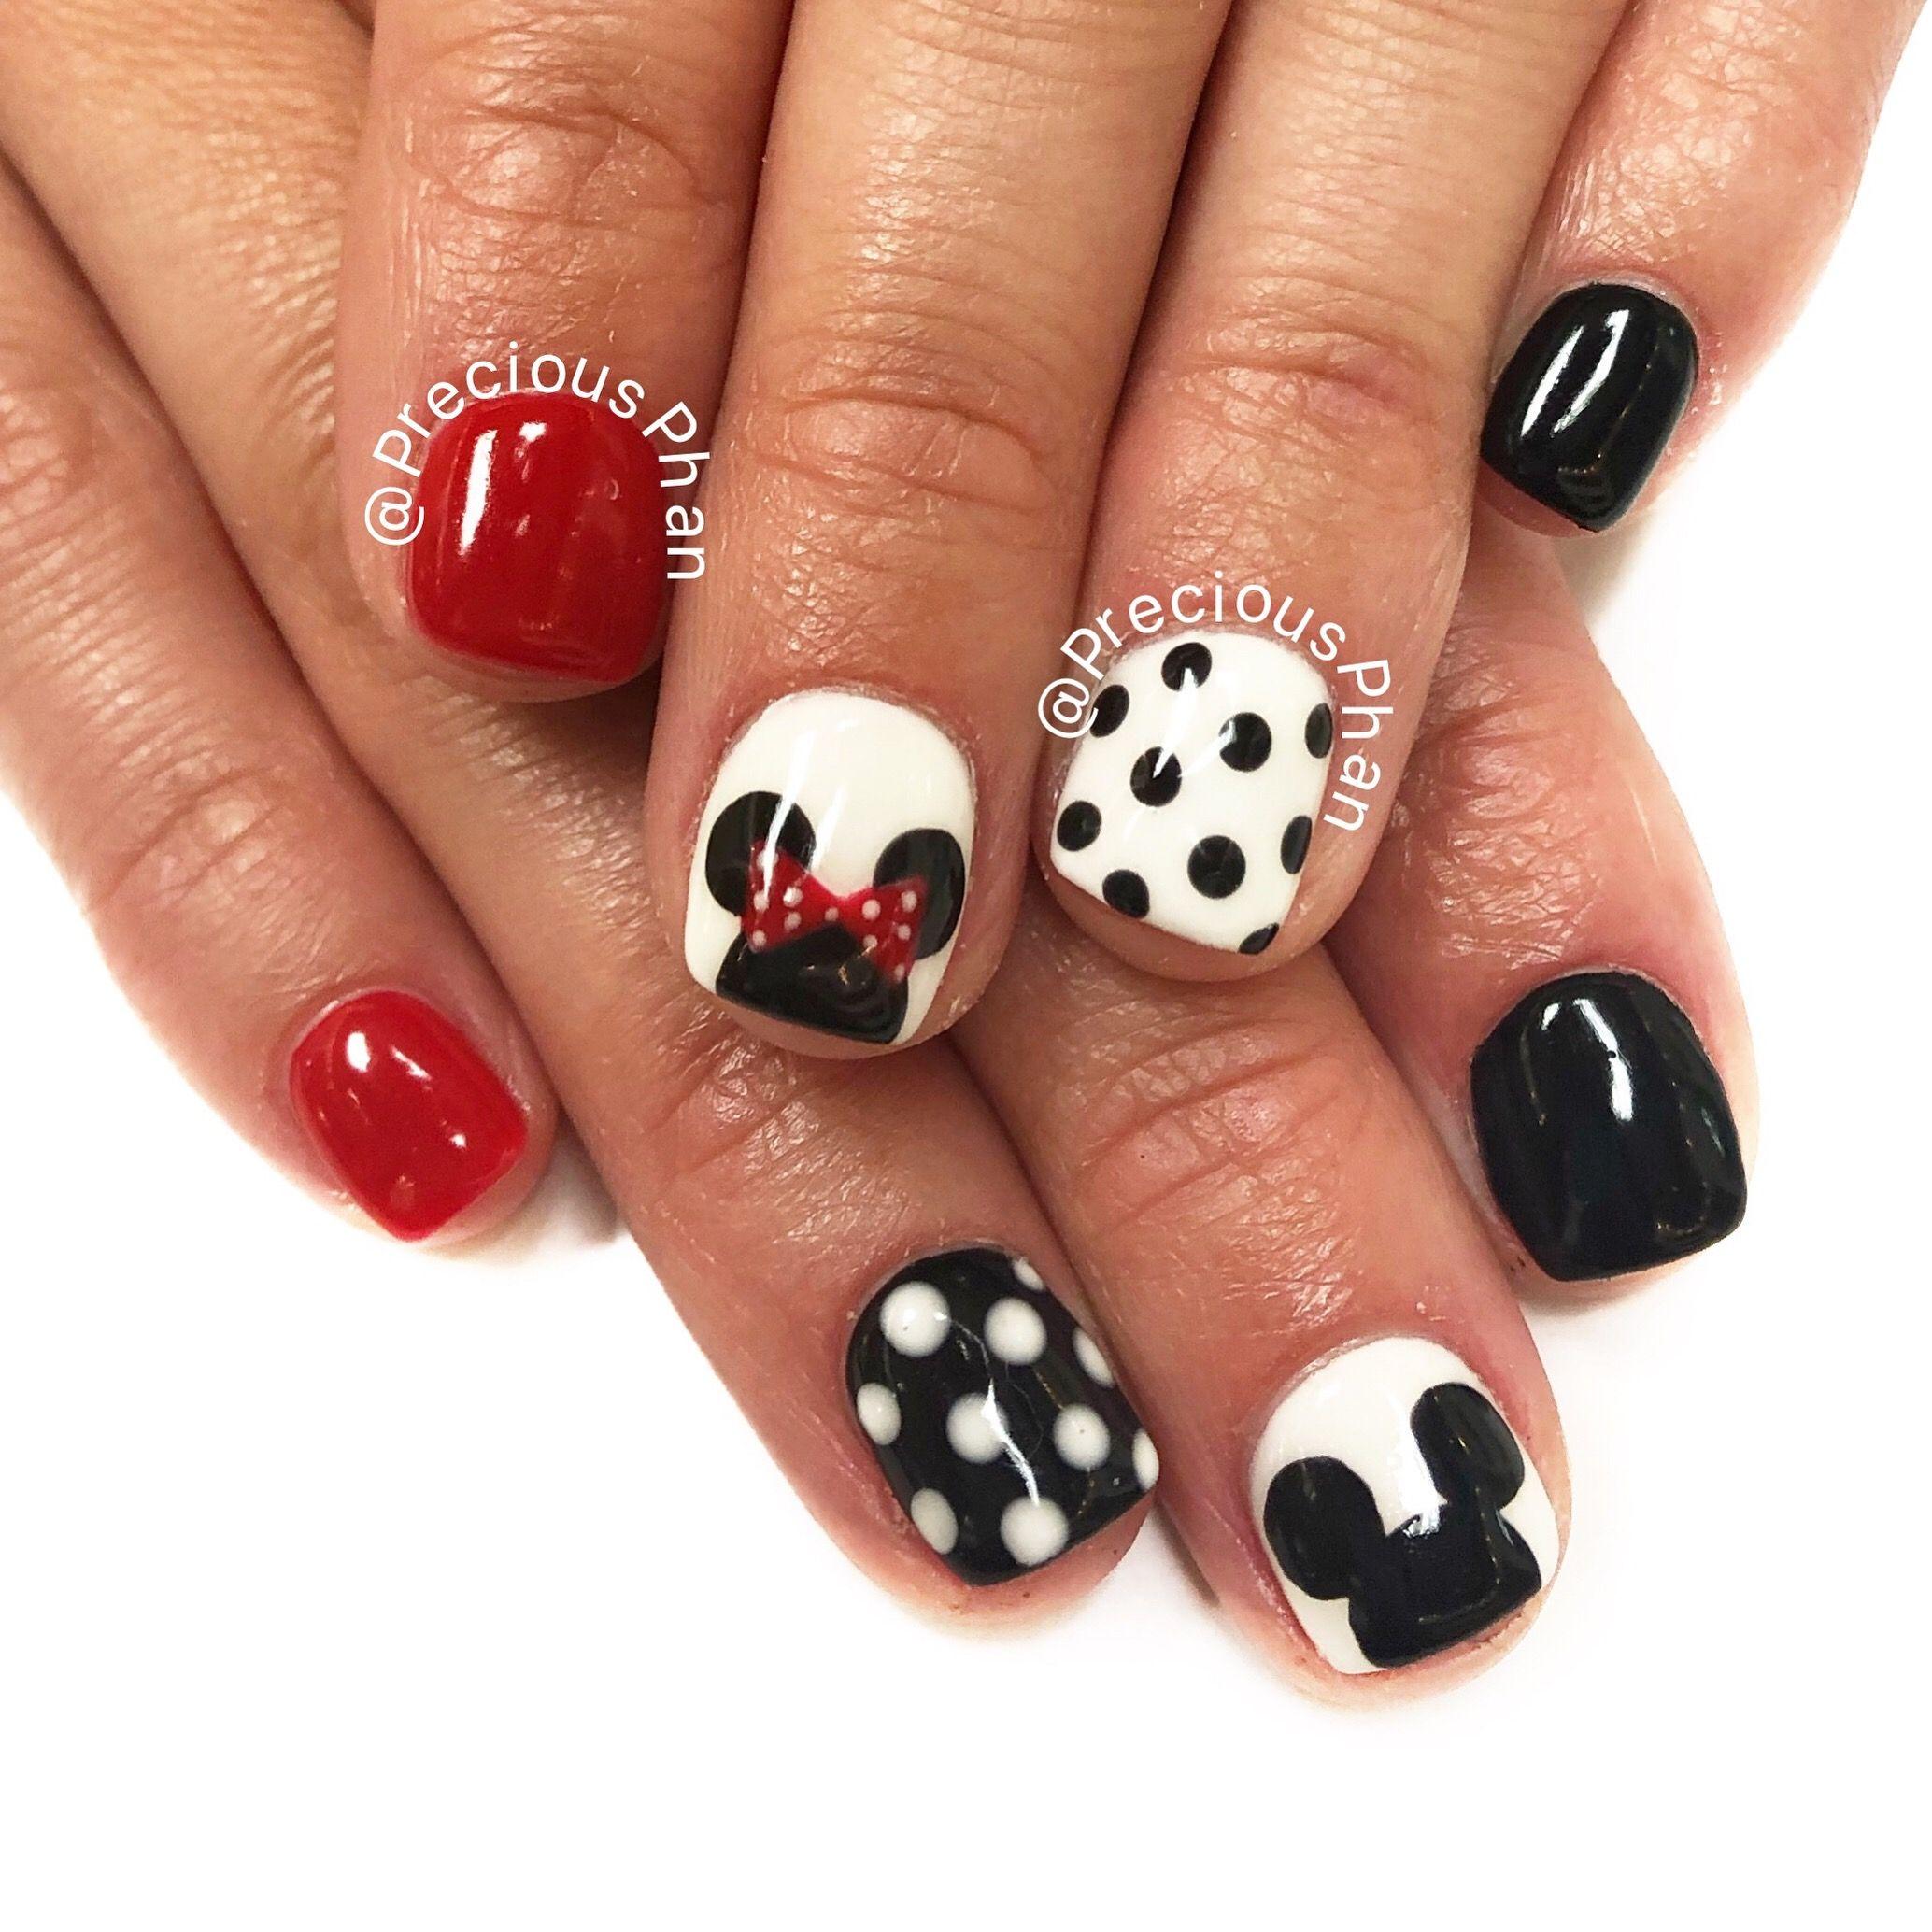 Disney Nails Mickey Mouse Minnie Mouse Nails Red White And Black Nails Polka Dots Preciousphan Minnie Mouse Nails Mickey Nails Mickey Mouse Nails